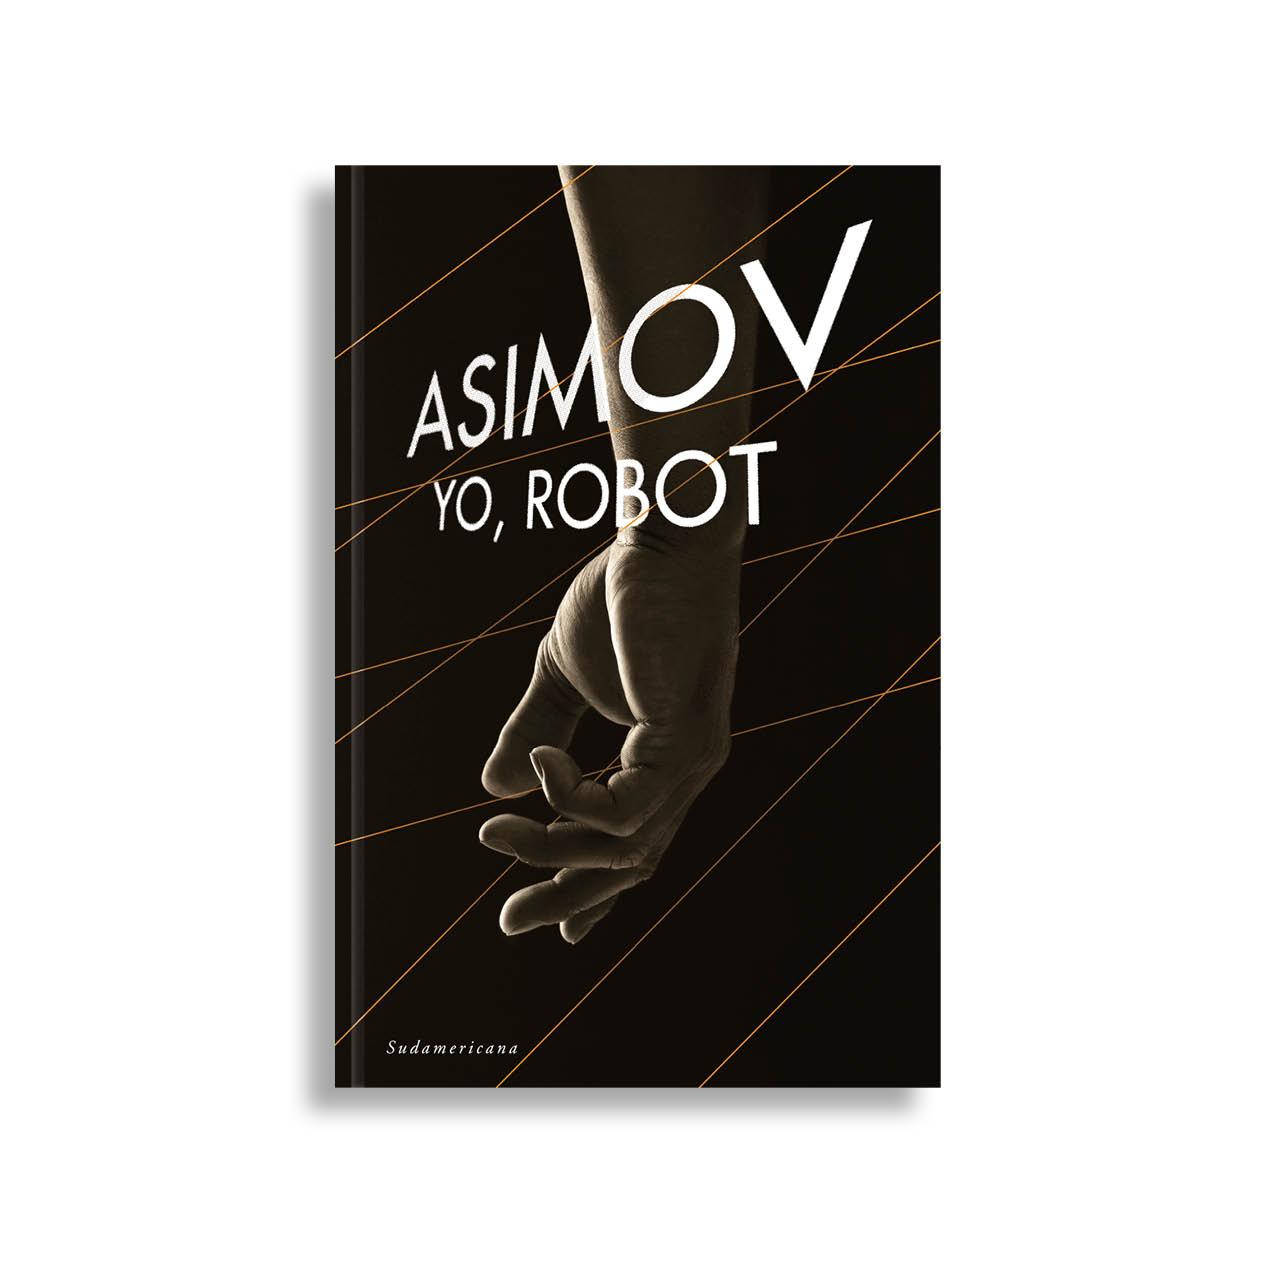 DB - Asimov 6